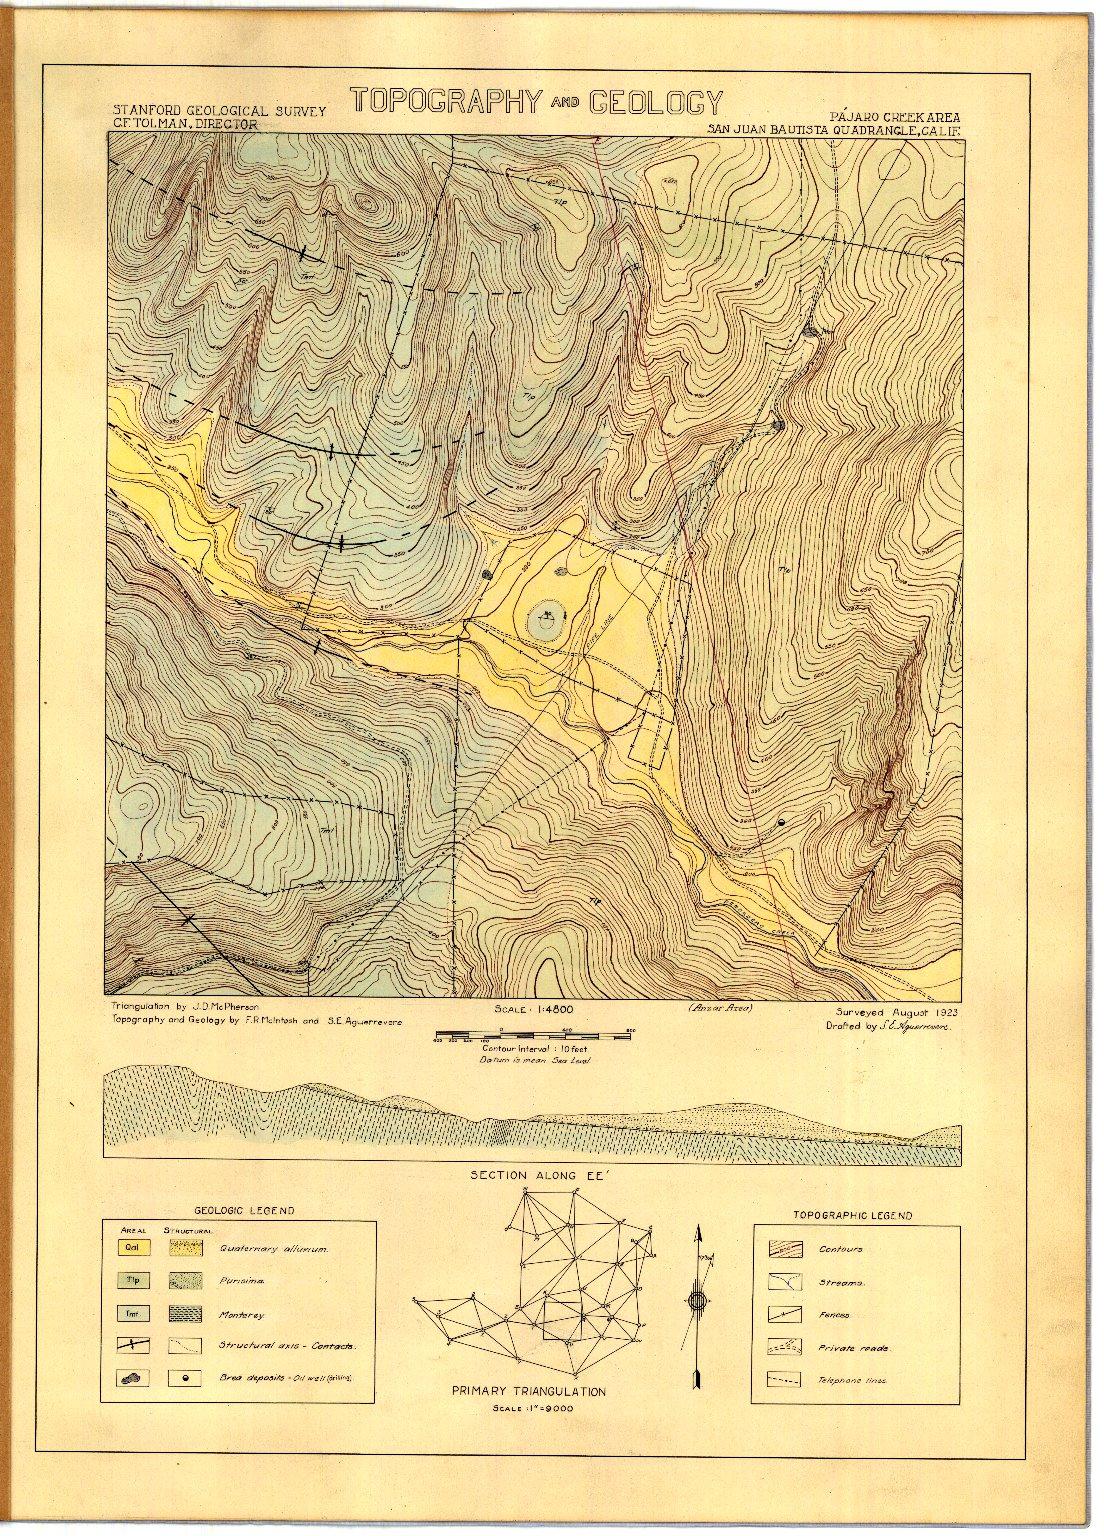 Geologic folio of a part of the San Juan Bautista quadrangle.